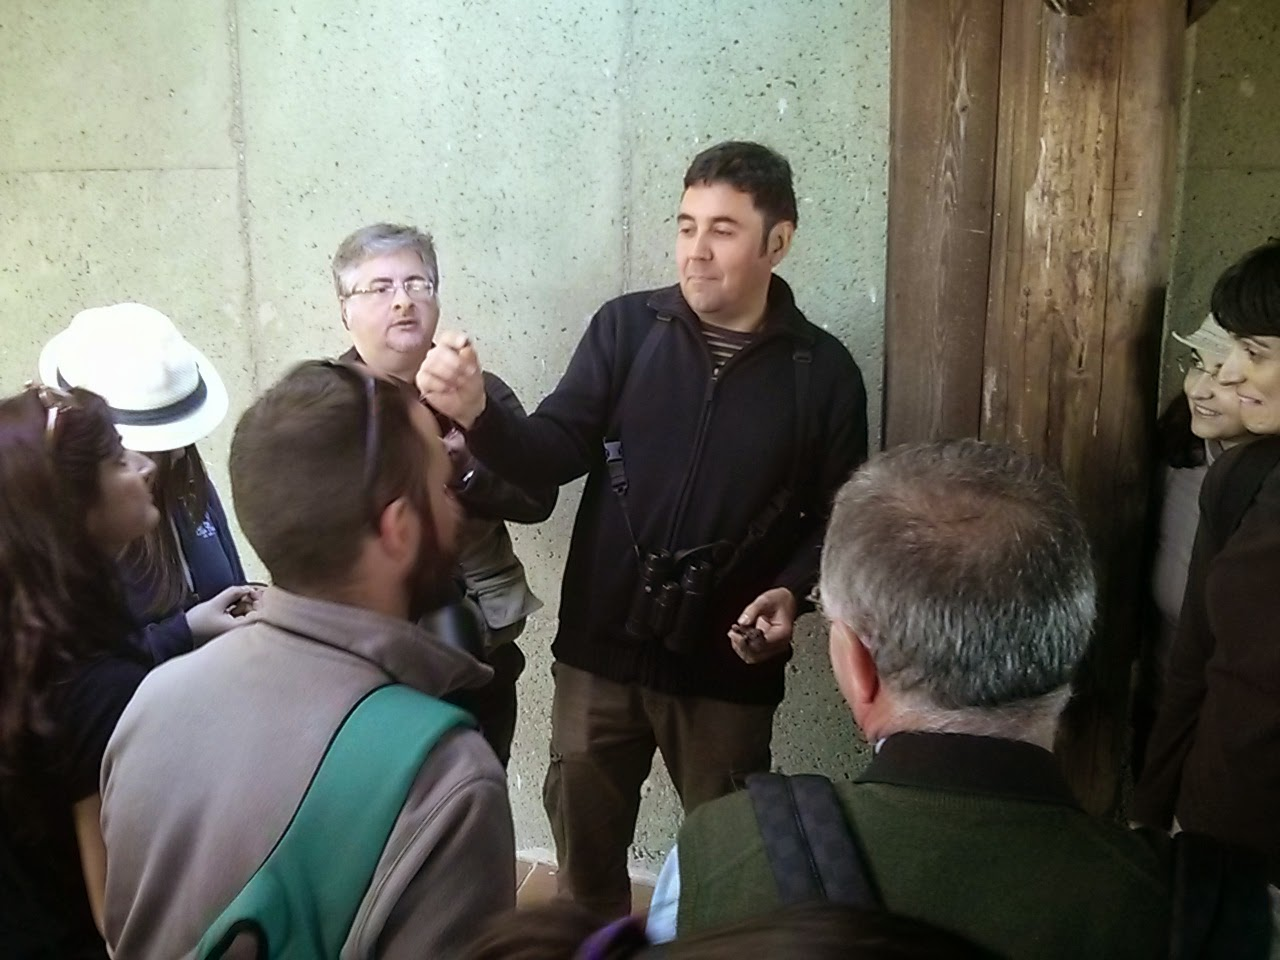 XV Curso de Iniciación a la Ornitología, Edición 2015. Organiza el Grupo Local SEO-Sevilla de SEO/BirdLife. Excursión.